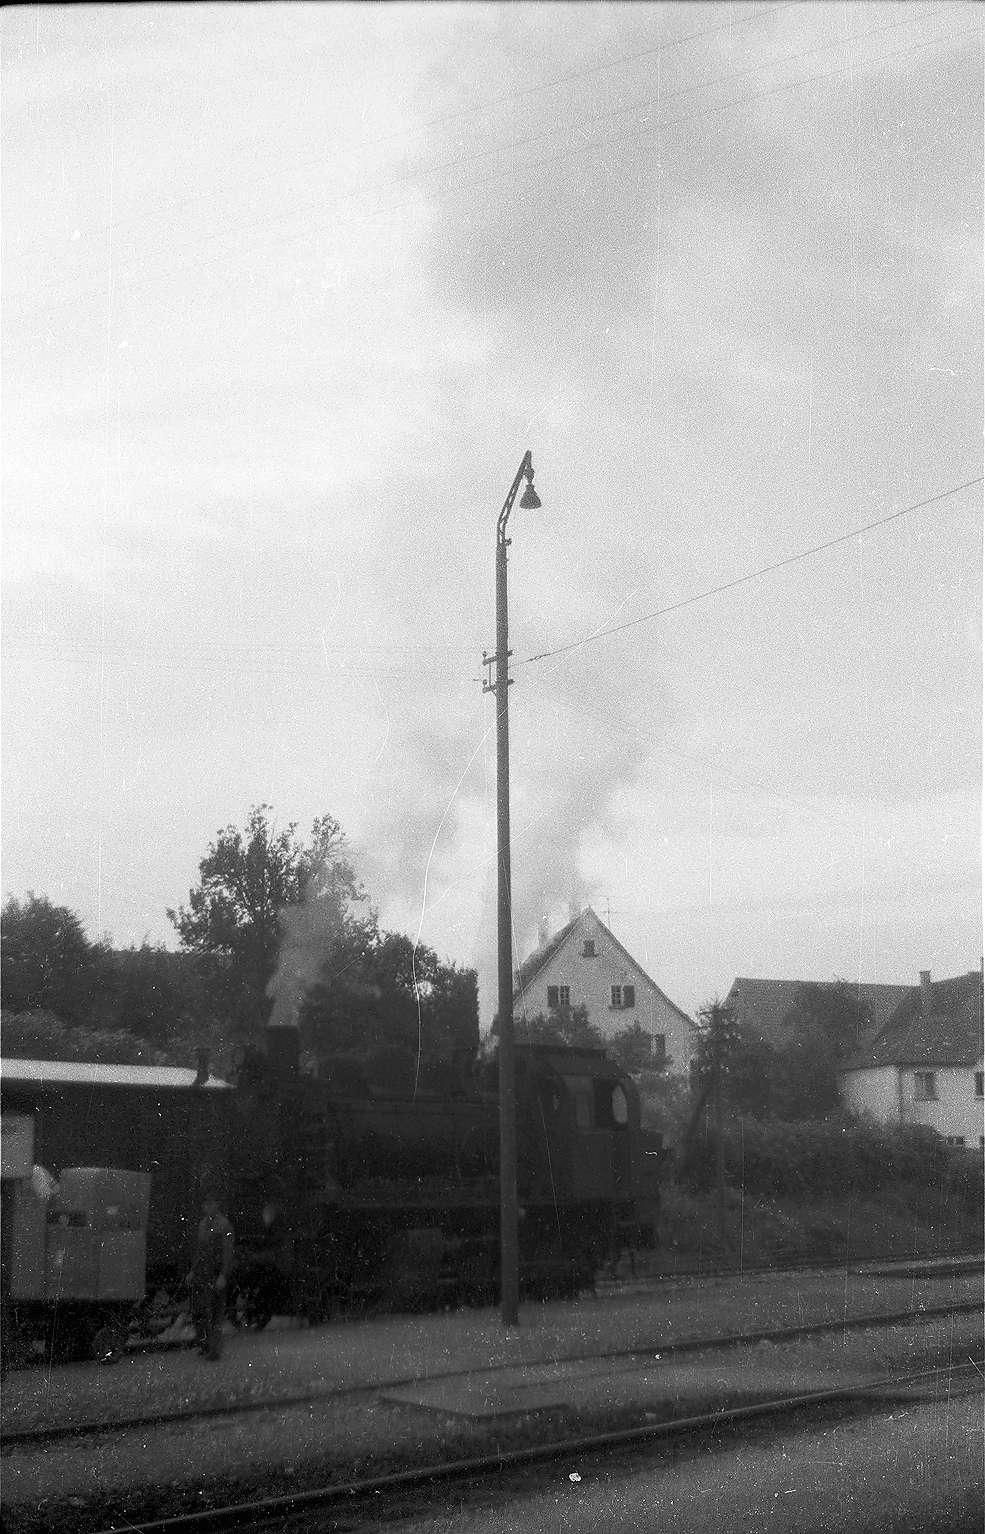 Sigmaringendorf, Lok 141, Zug 304, abfahrbereit, Bild 1